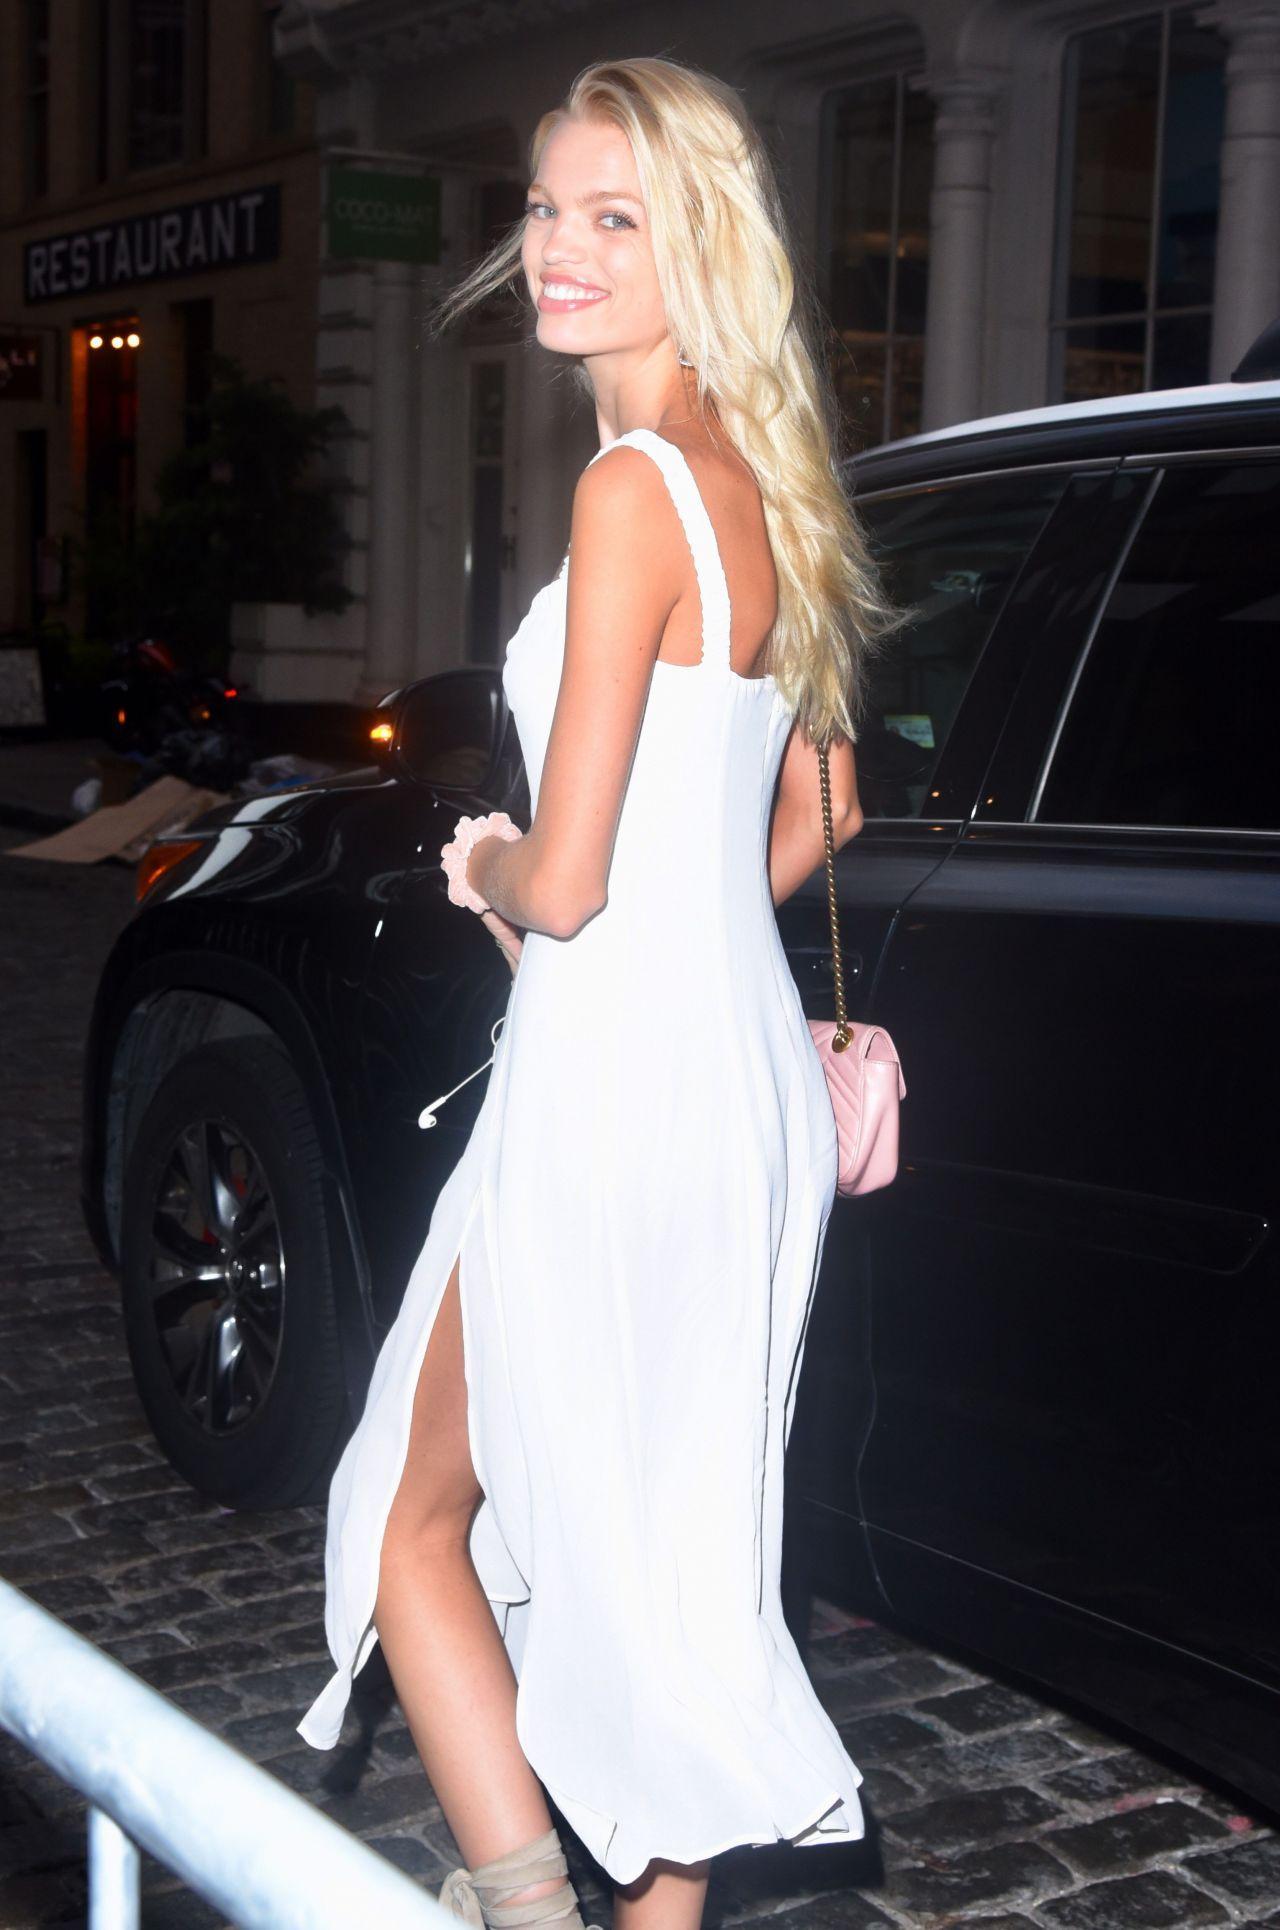 Celebrity Johanna Szikszai nudes (63 photo), Topless, Bikini, Instagram, cameltoe 2015